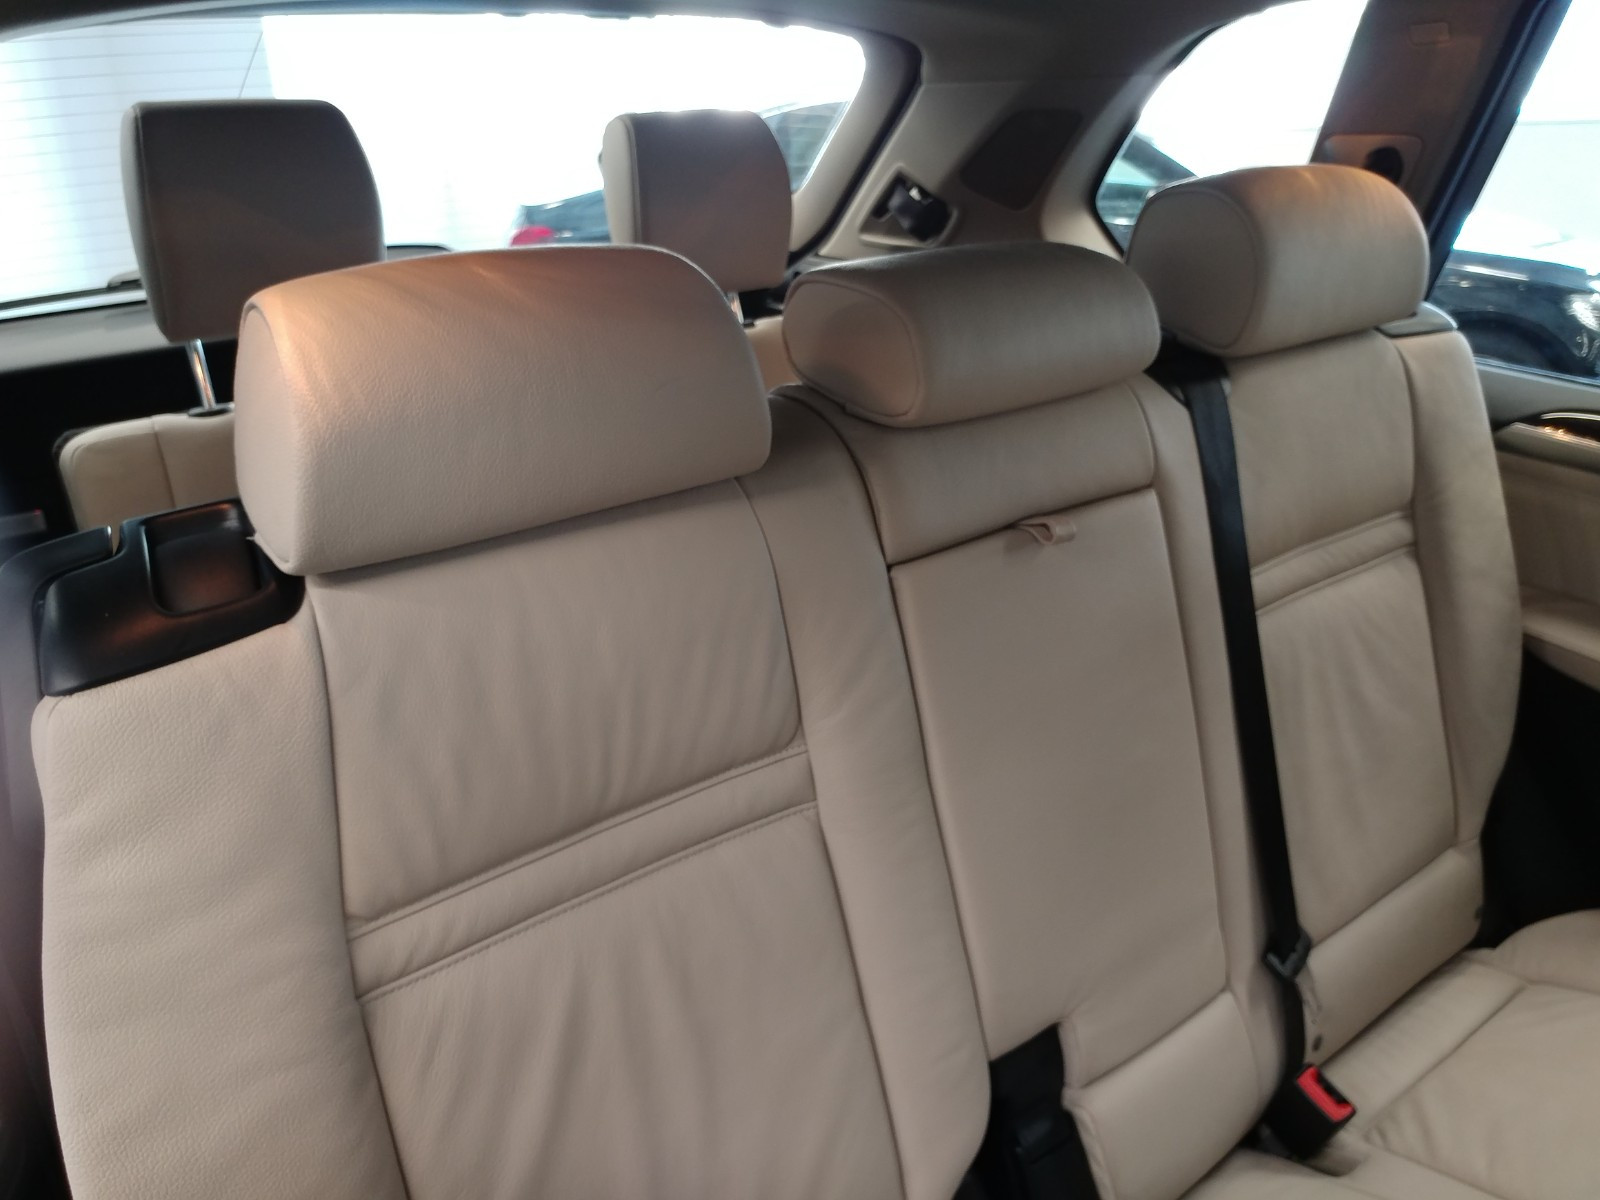 X5 xDrive 35i - 7座 TwinPowerTurbo - Image 6